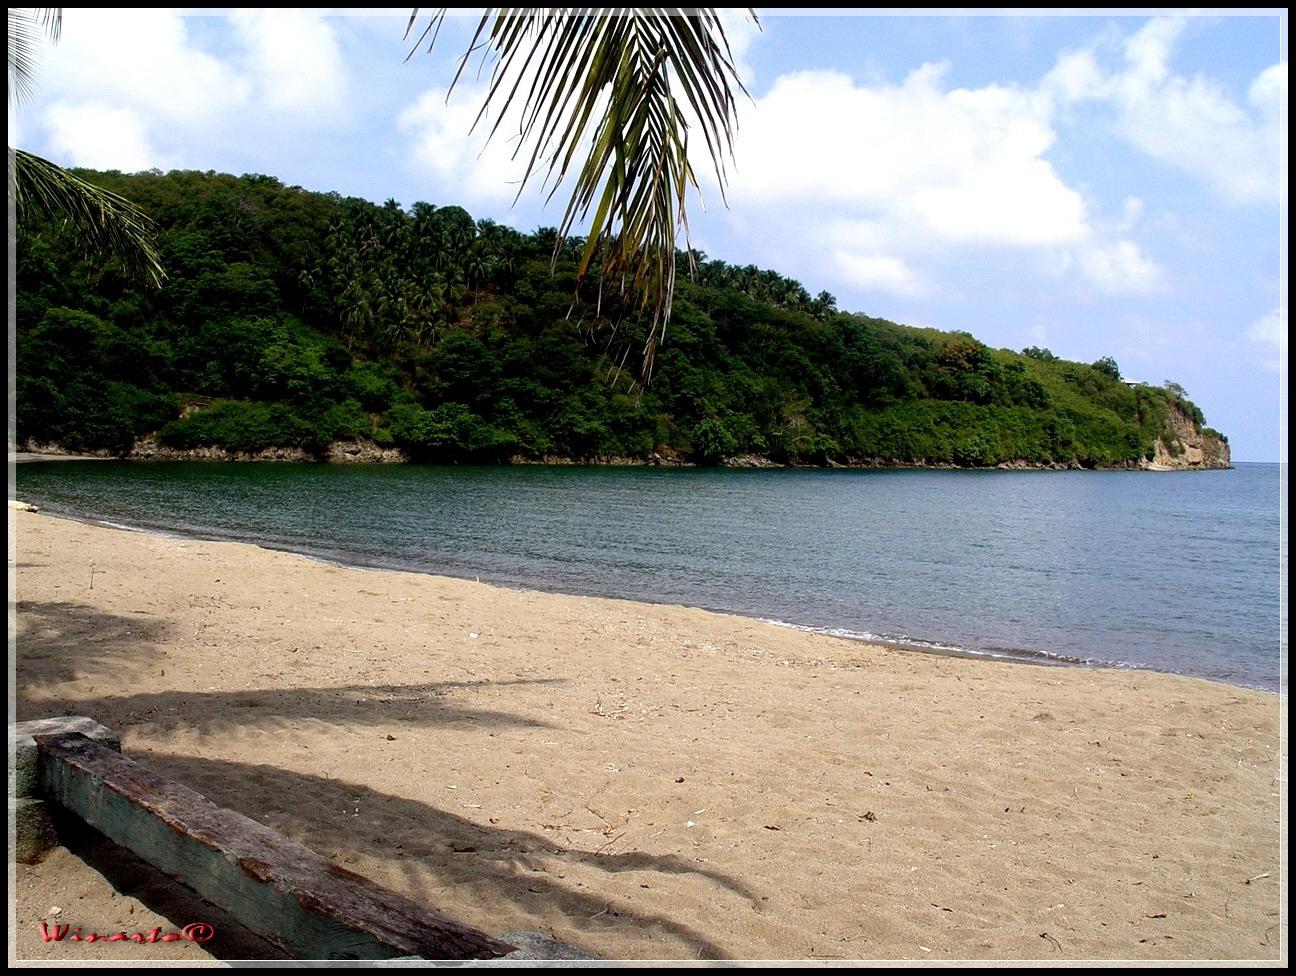 Berkas Teluk Buyat Jpg Wikipedia Bahasa Indonesia Ensiklopedia Bebas Pantai